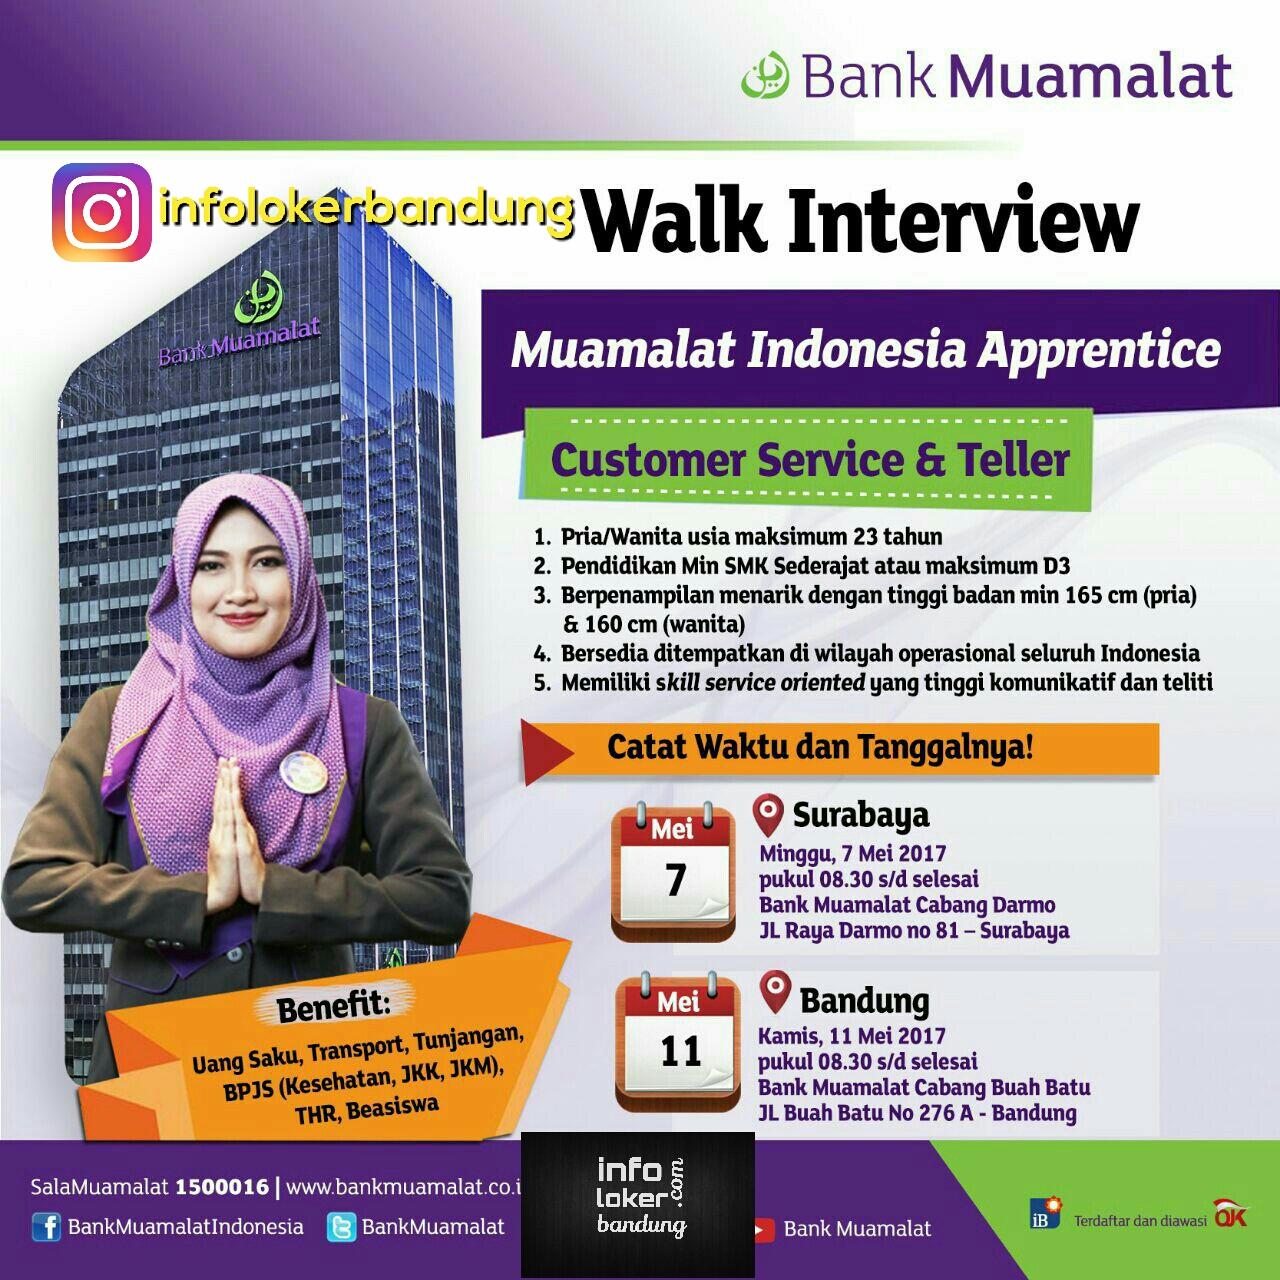 Lowongan Kerja Bank Muamalat Bandung ( Walk in Interview ) Mei 2017